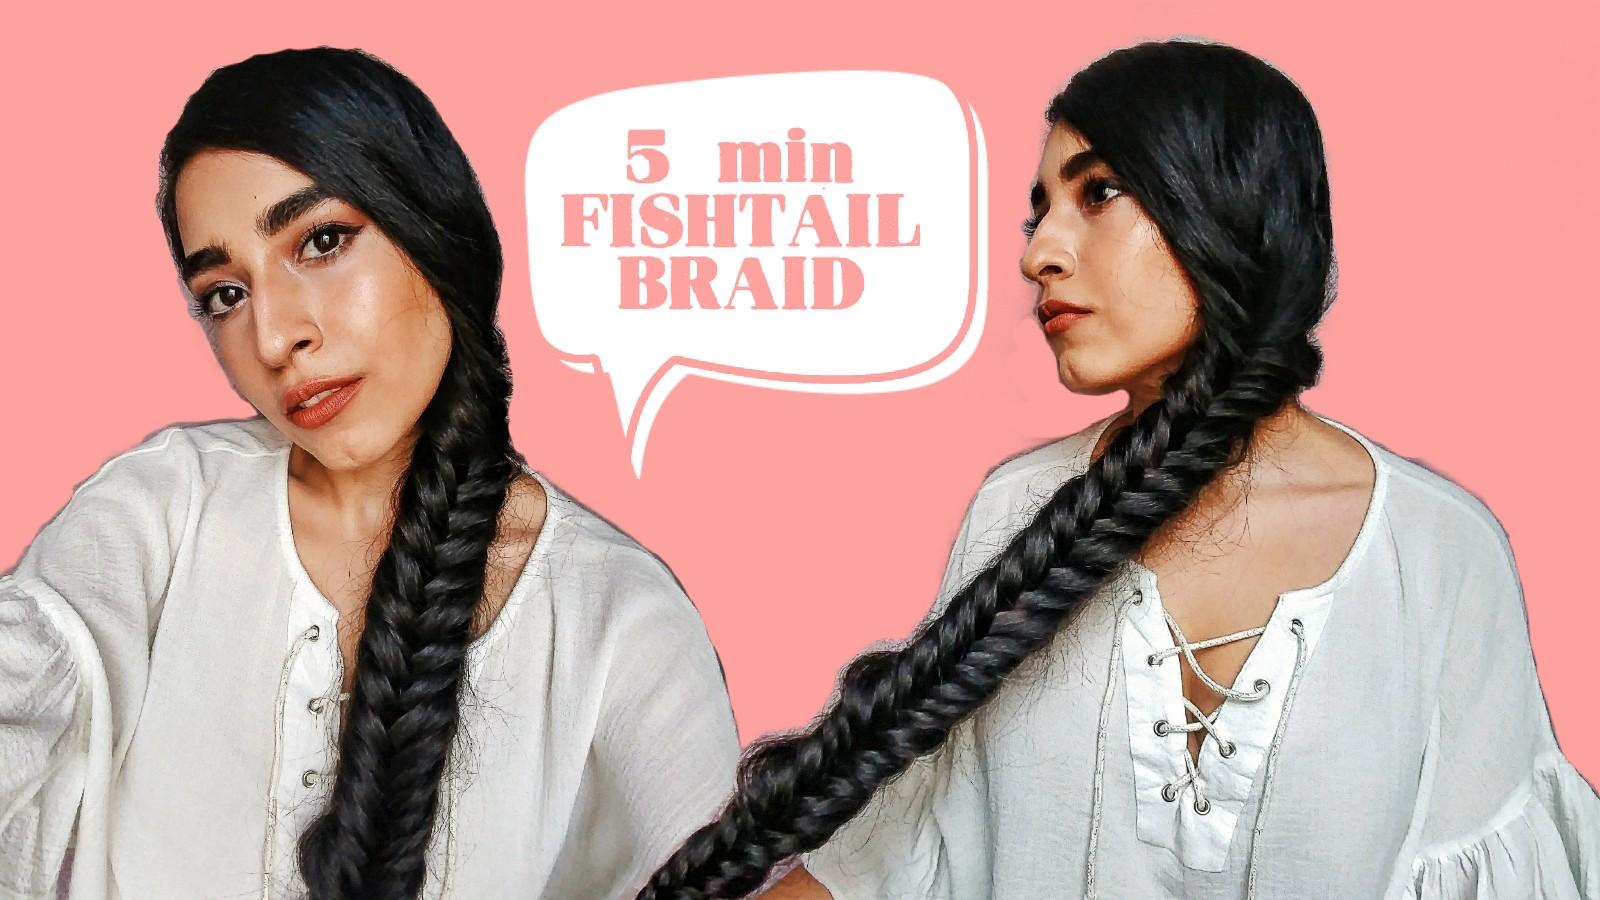 hairstyle, easy hairstyles, long hair, long hair, fishtail braid, 5 min hairstyle, hair tutorial, easy hair tutorial, fishtail braid hair tutorial